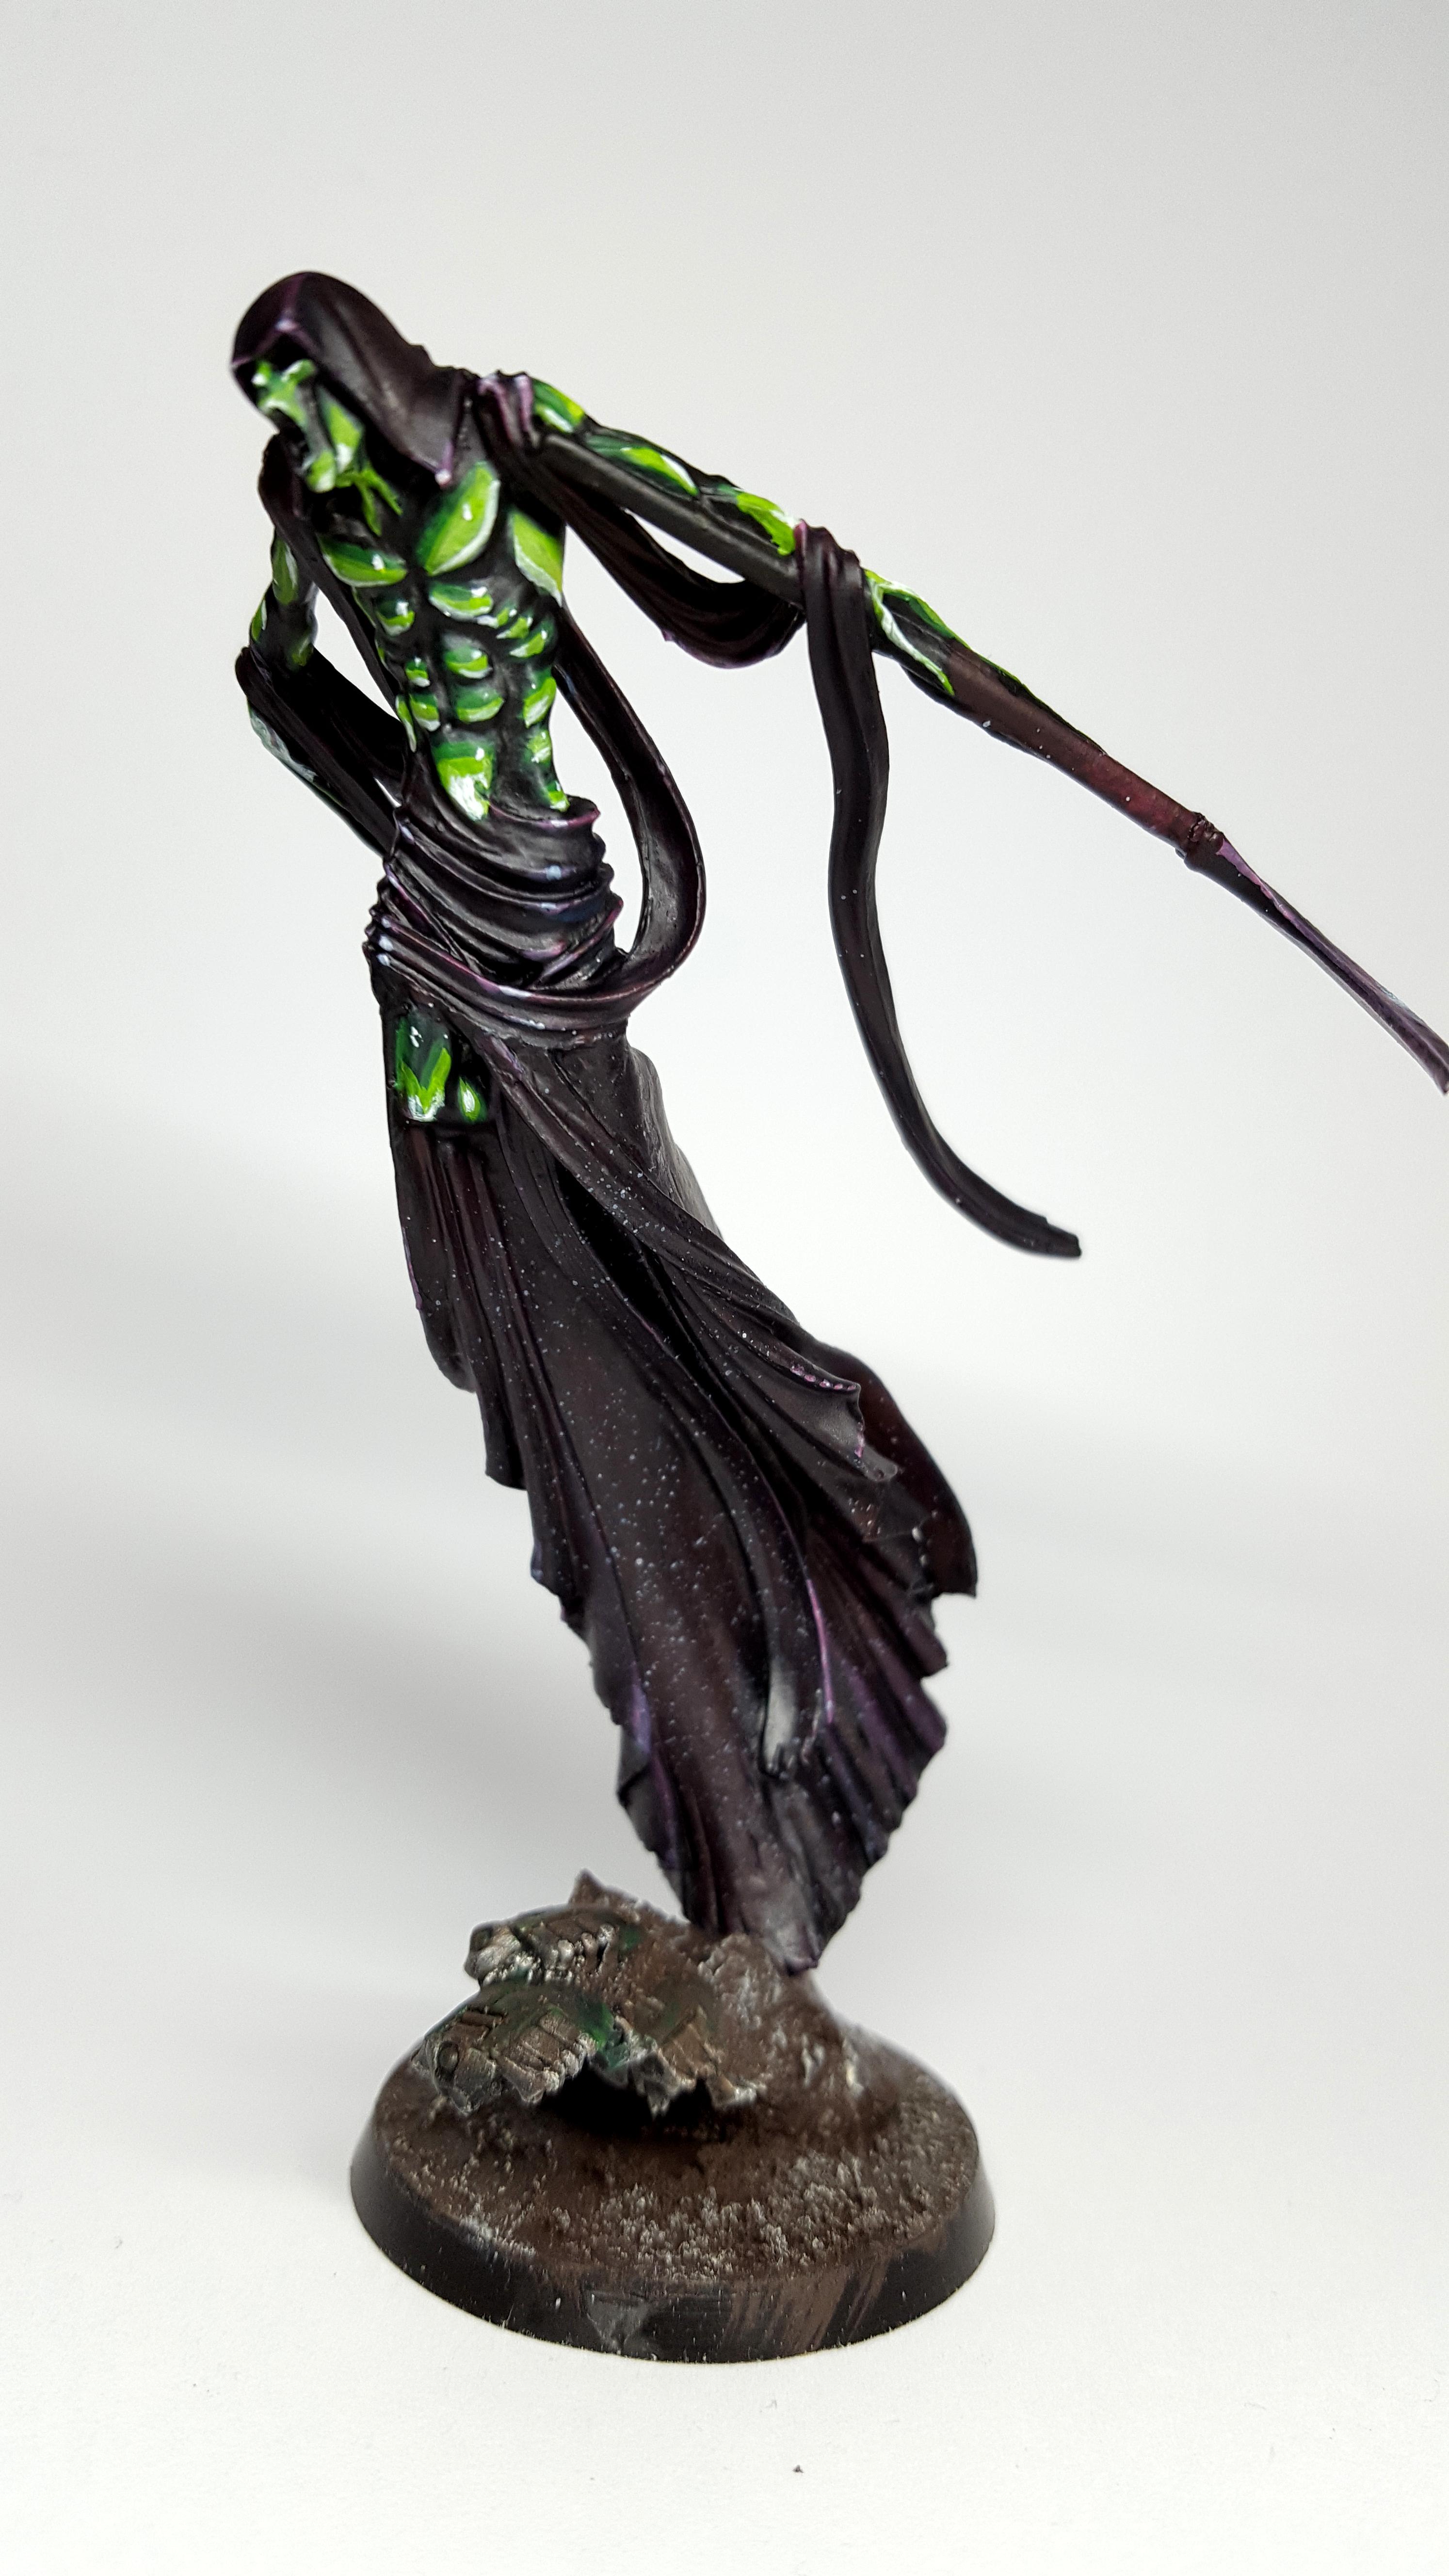 C'tan, Commission, Games Workshop, Headquarters, Necrons, Nightbringer, Non-metallic, Shard, Warhammer 40,000, Warhammer Fantasy